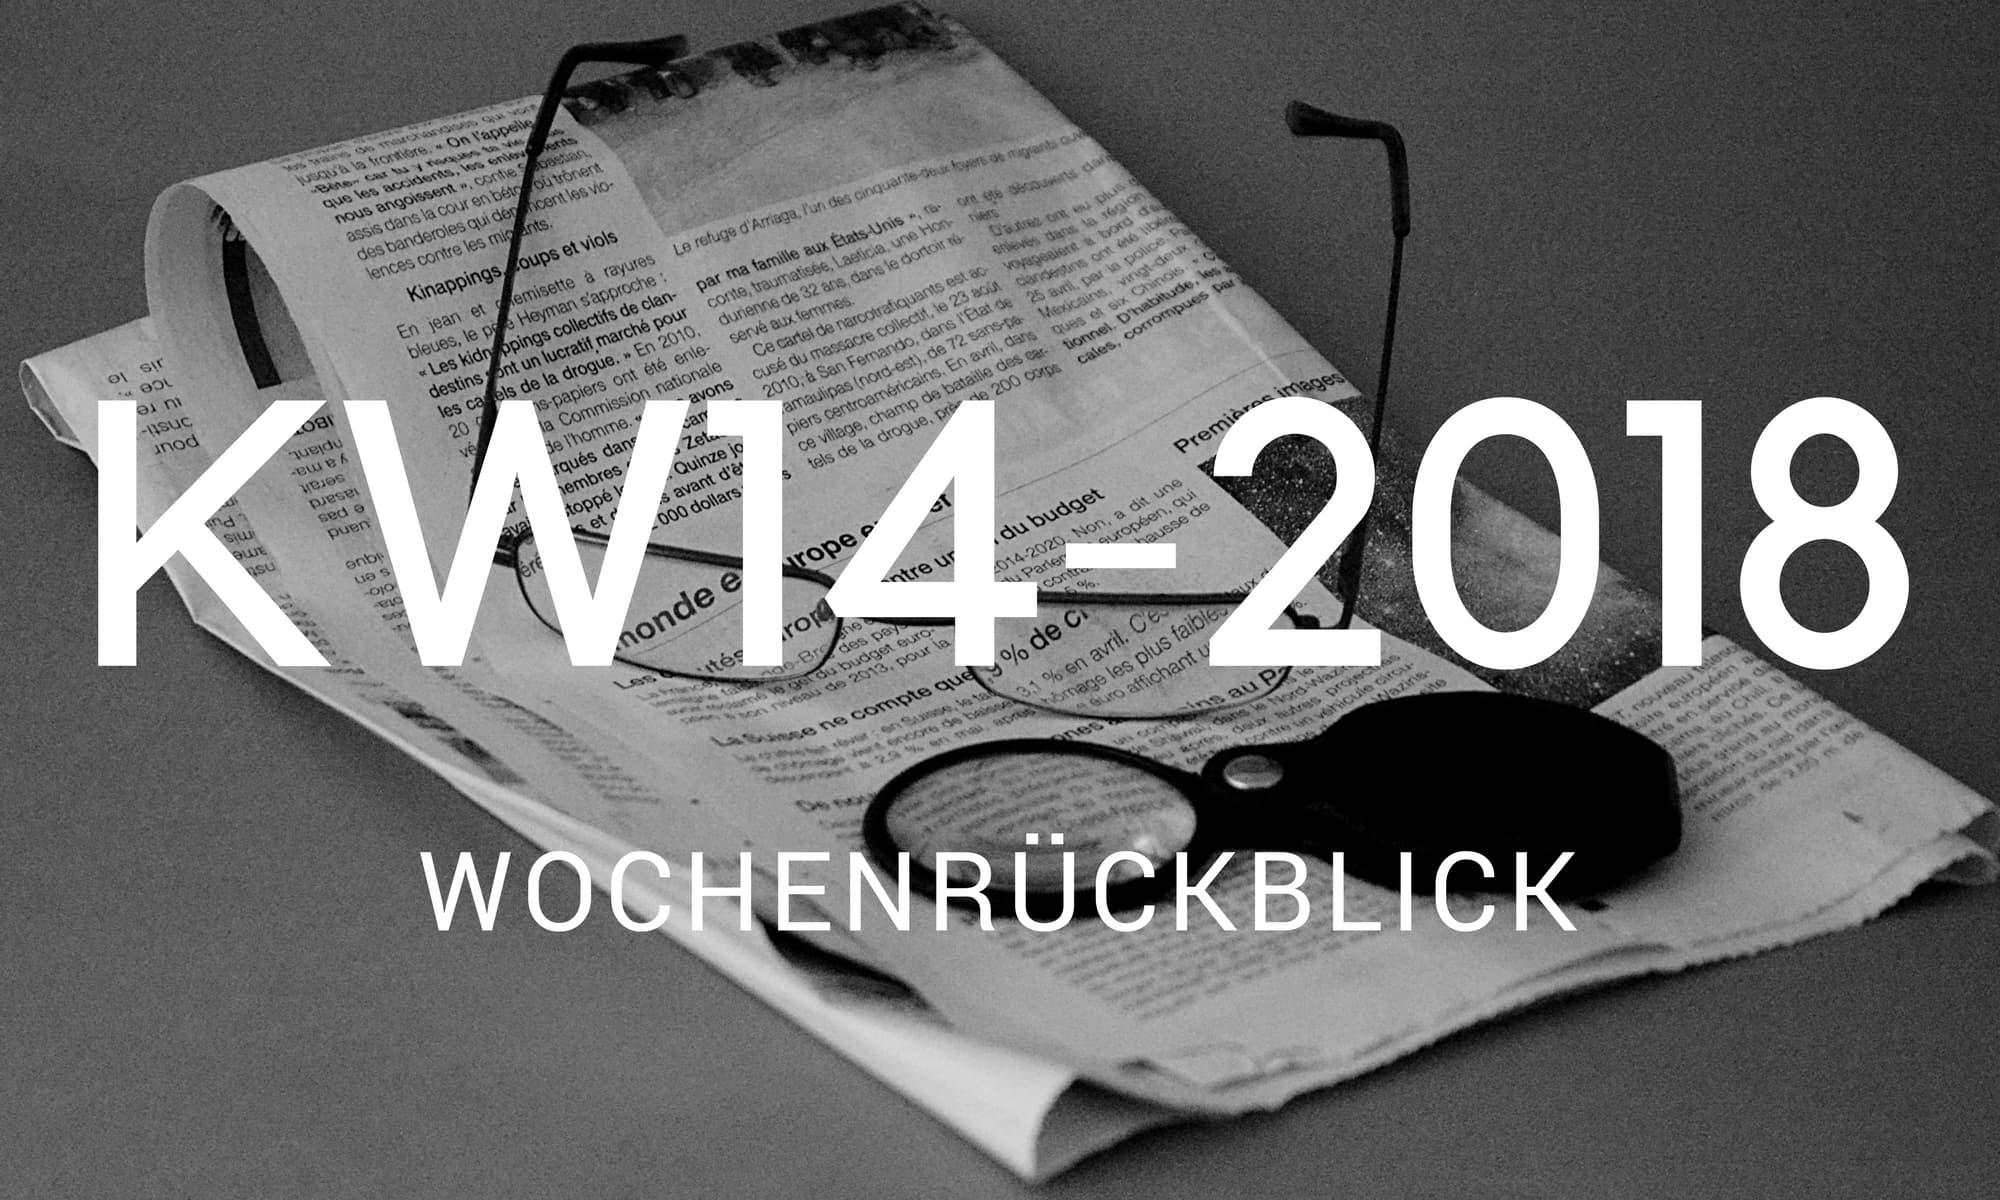 wochenrueckblick camping news KW14 2018